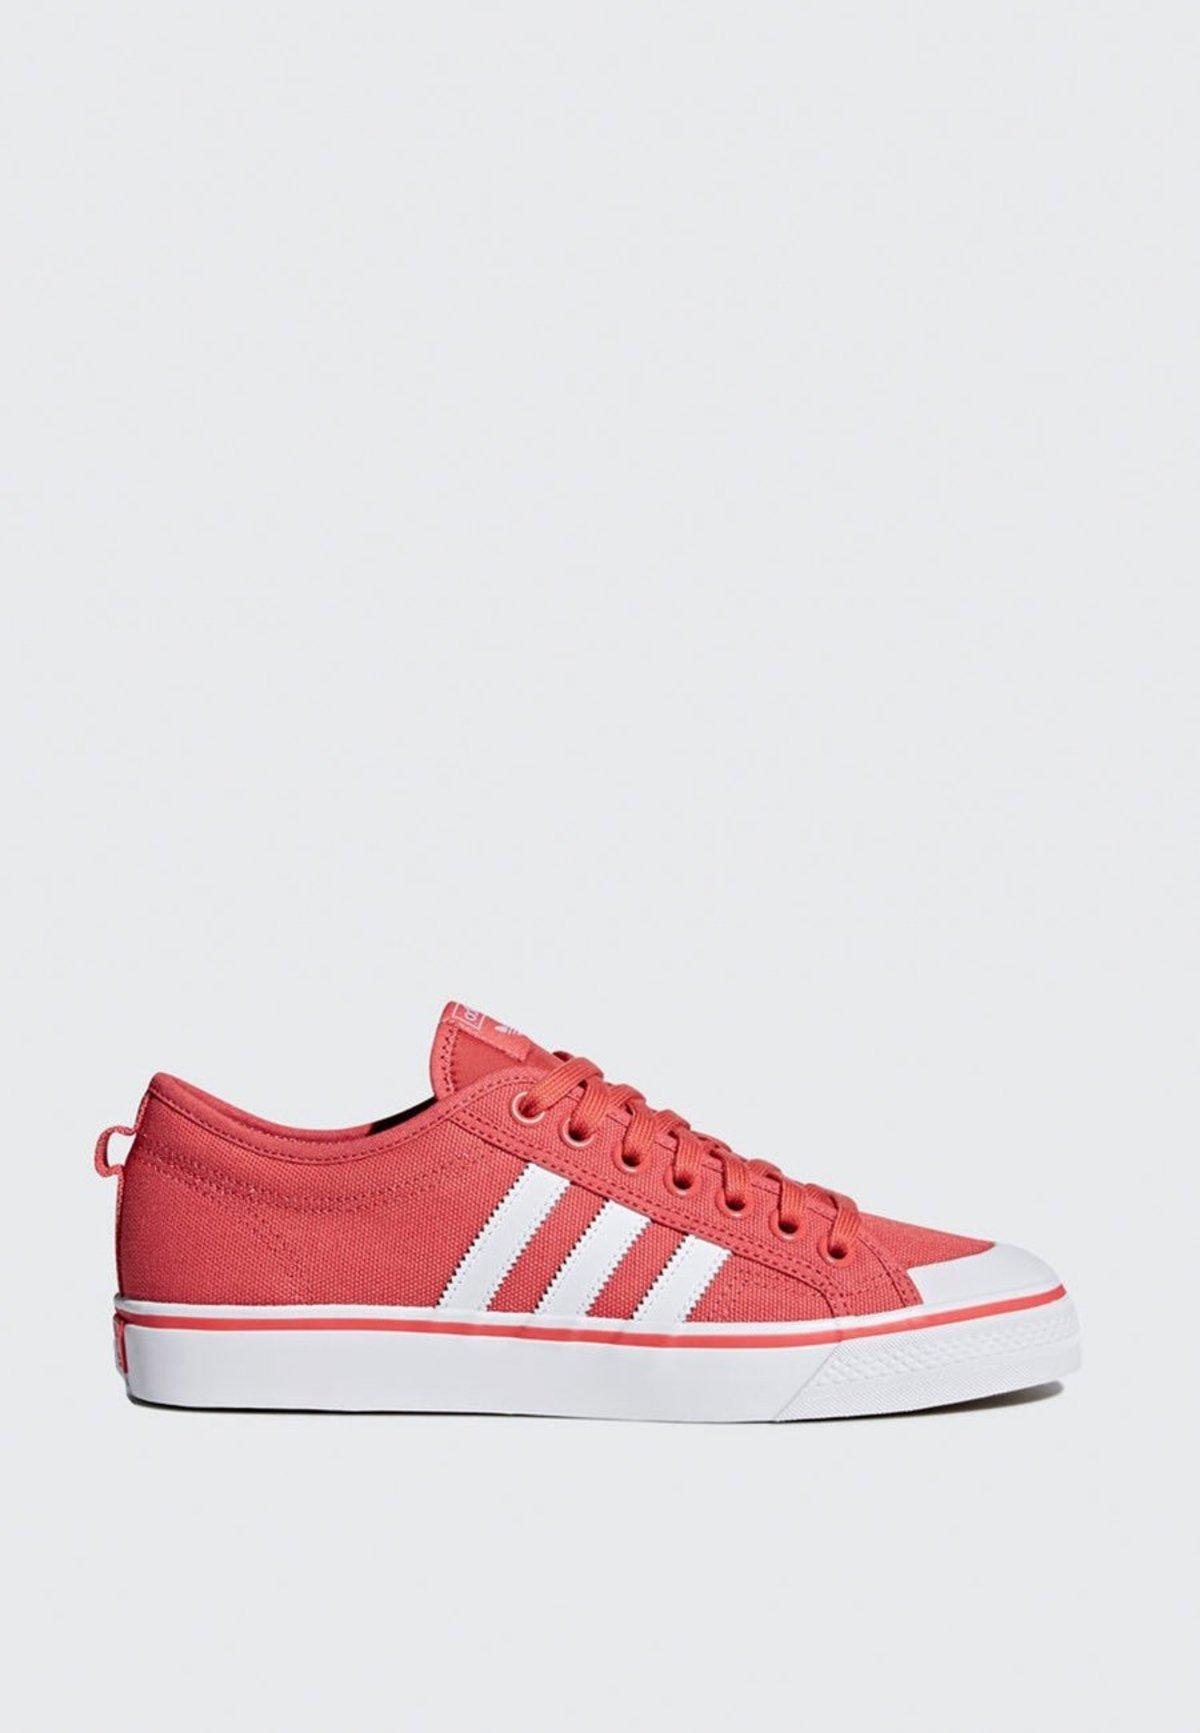 423ba66835d Adidas Originals Nizza sneaker - trace scarlet white cloud